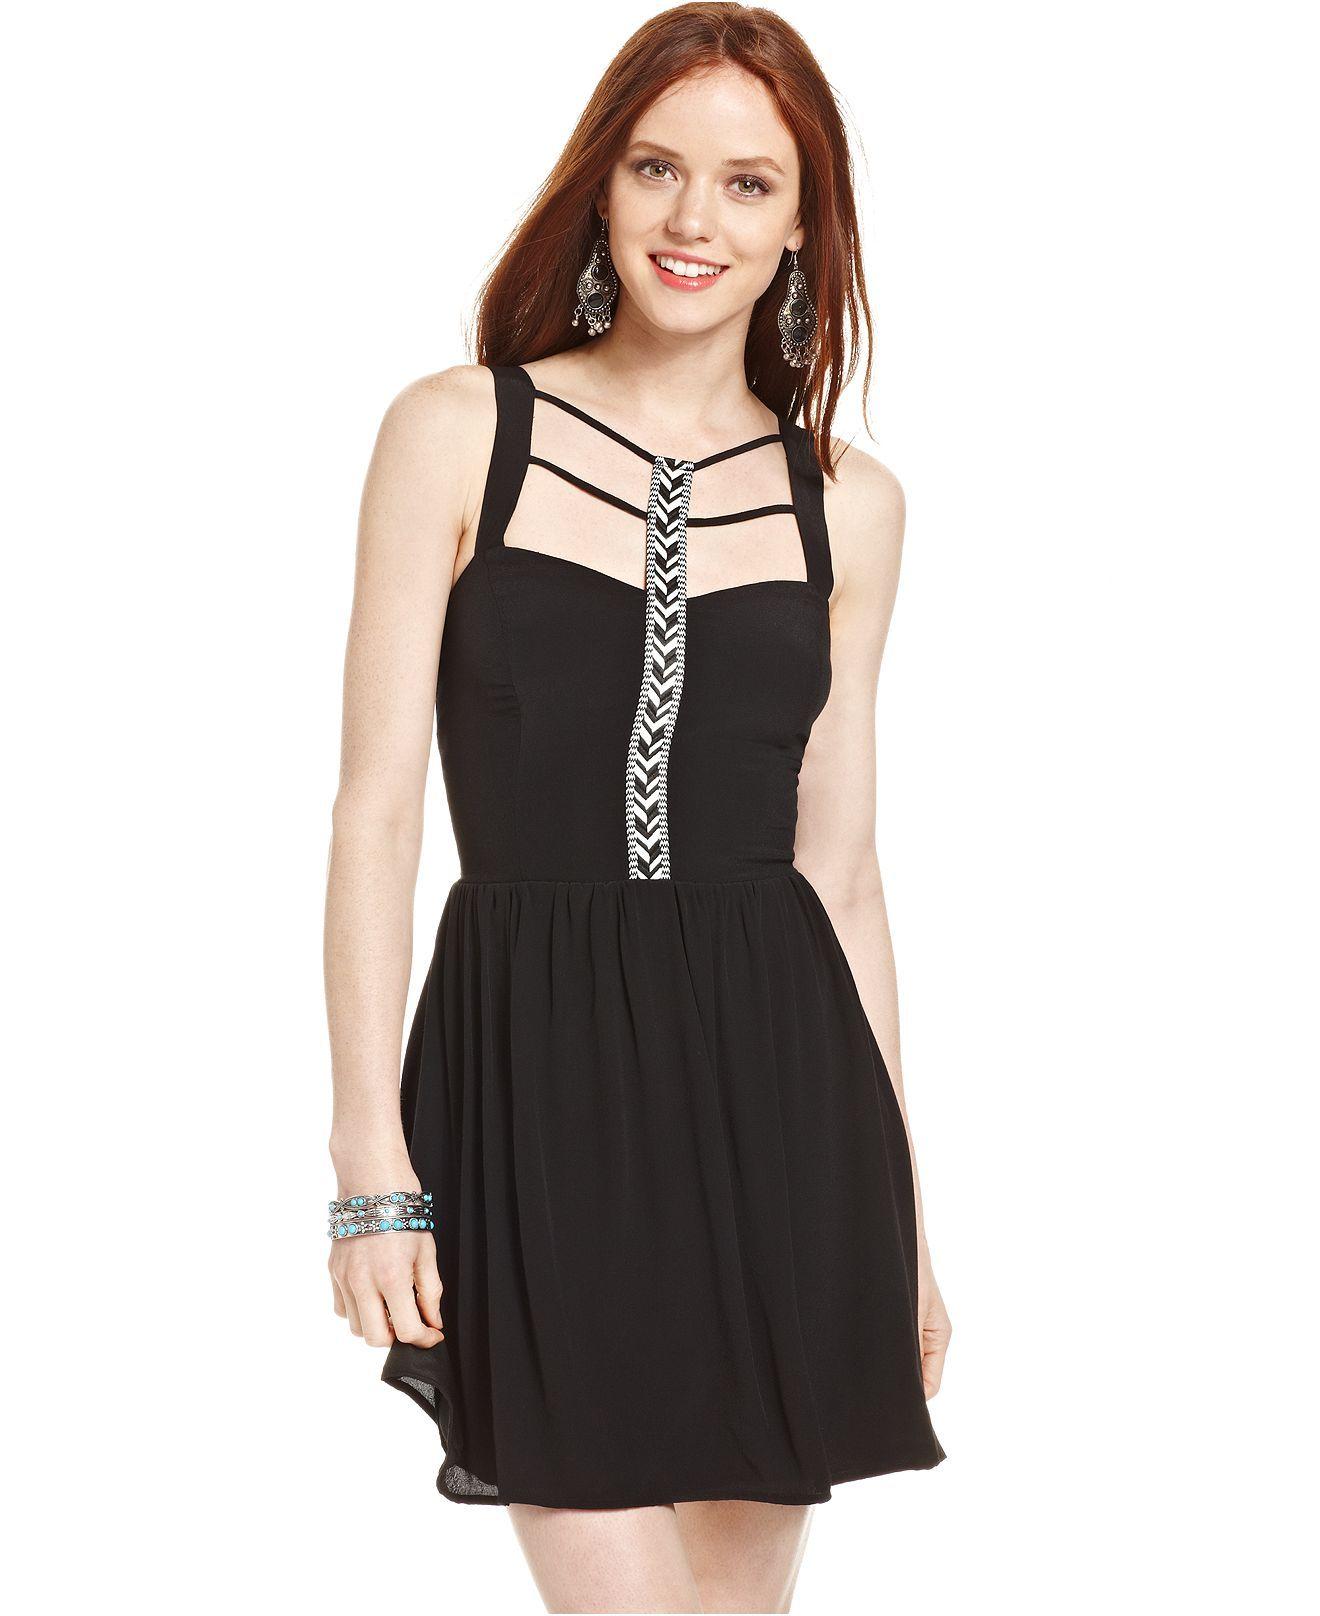 Black dress teenager - Trixxi Juniors Embroidered Trim Dress Juniors Dresses Macy S